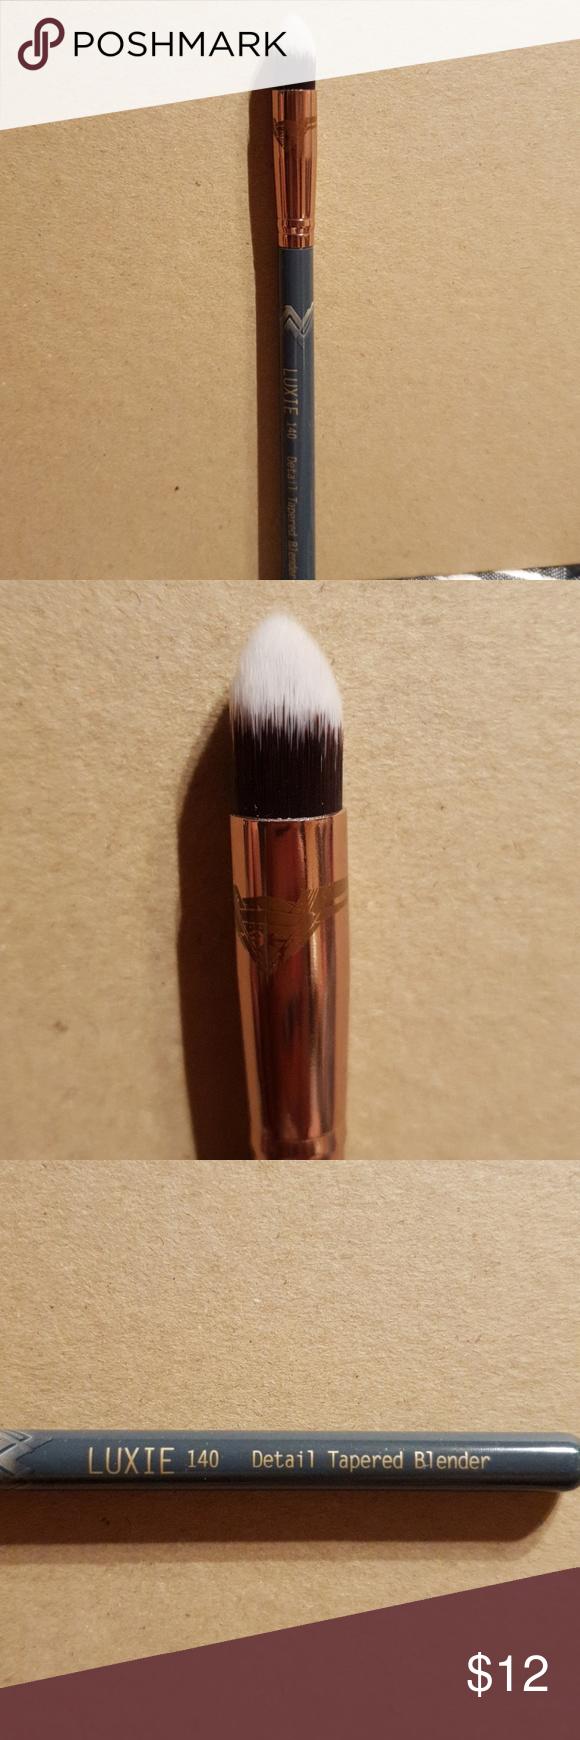 Luxie140 wonder woman detail tapered blender brush Brush